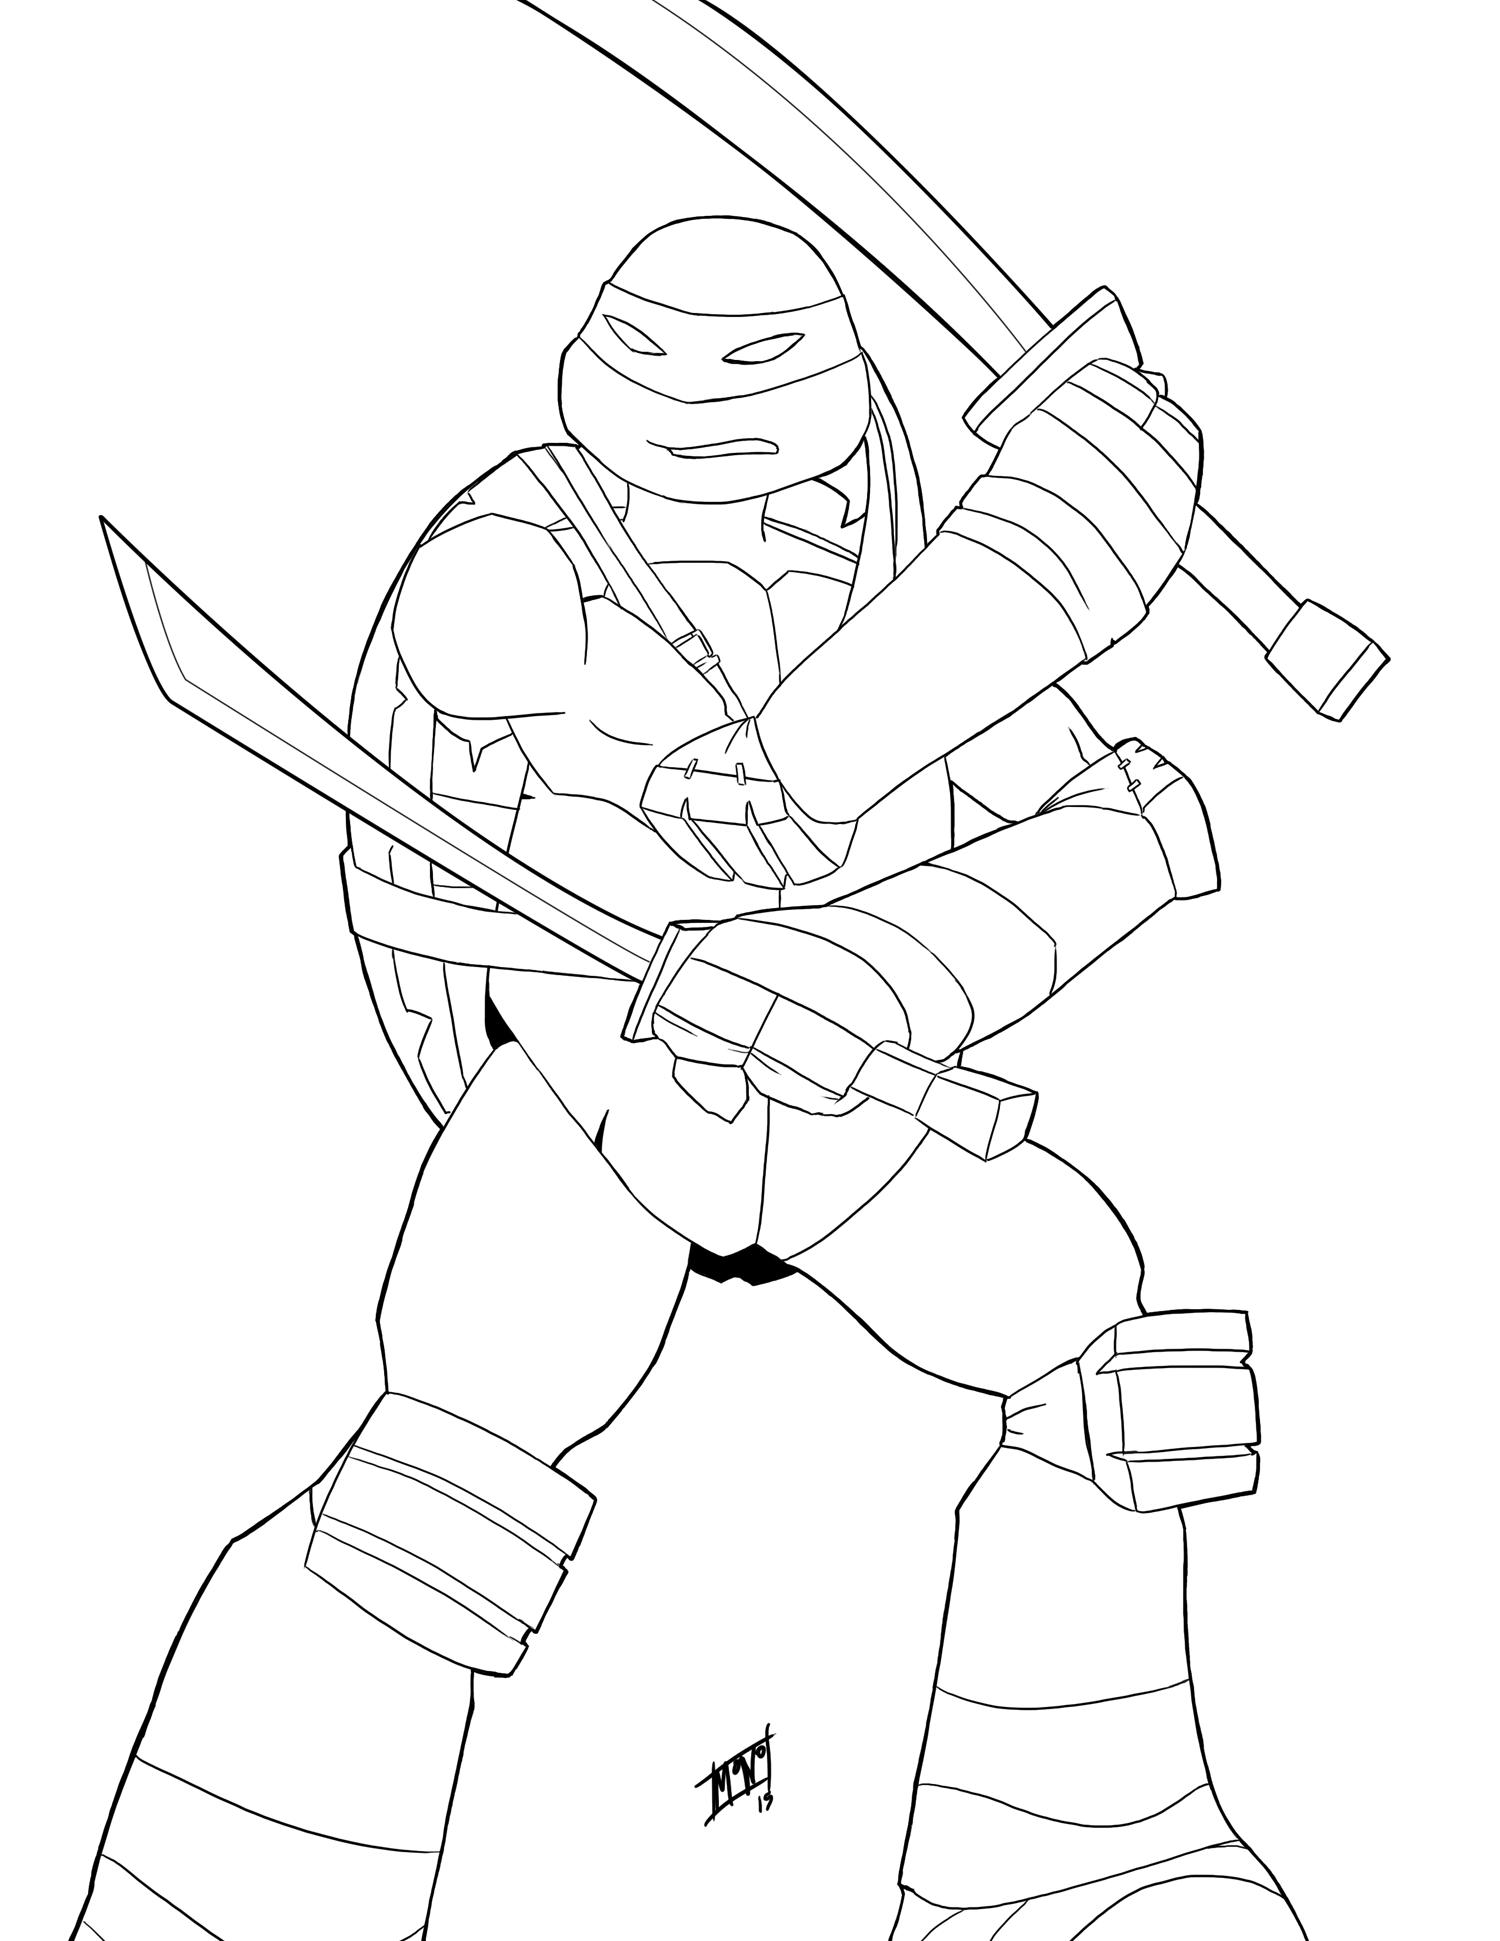 Line Art Ninja Turtles : Line nick tmnt leonardo by mono phos on deviantart